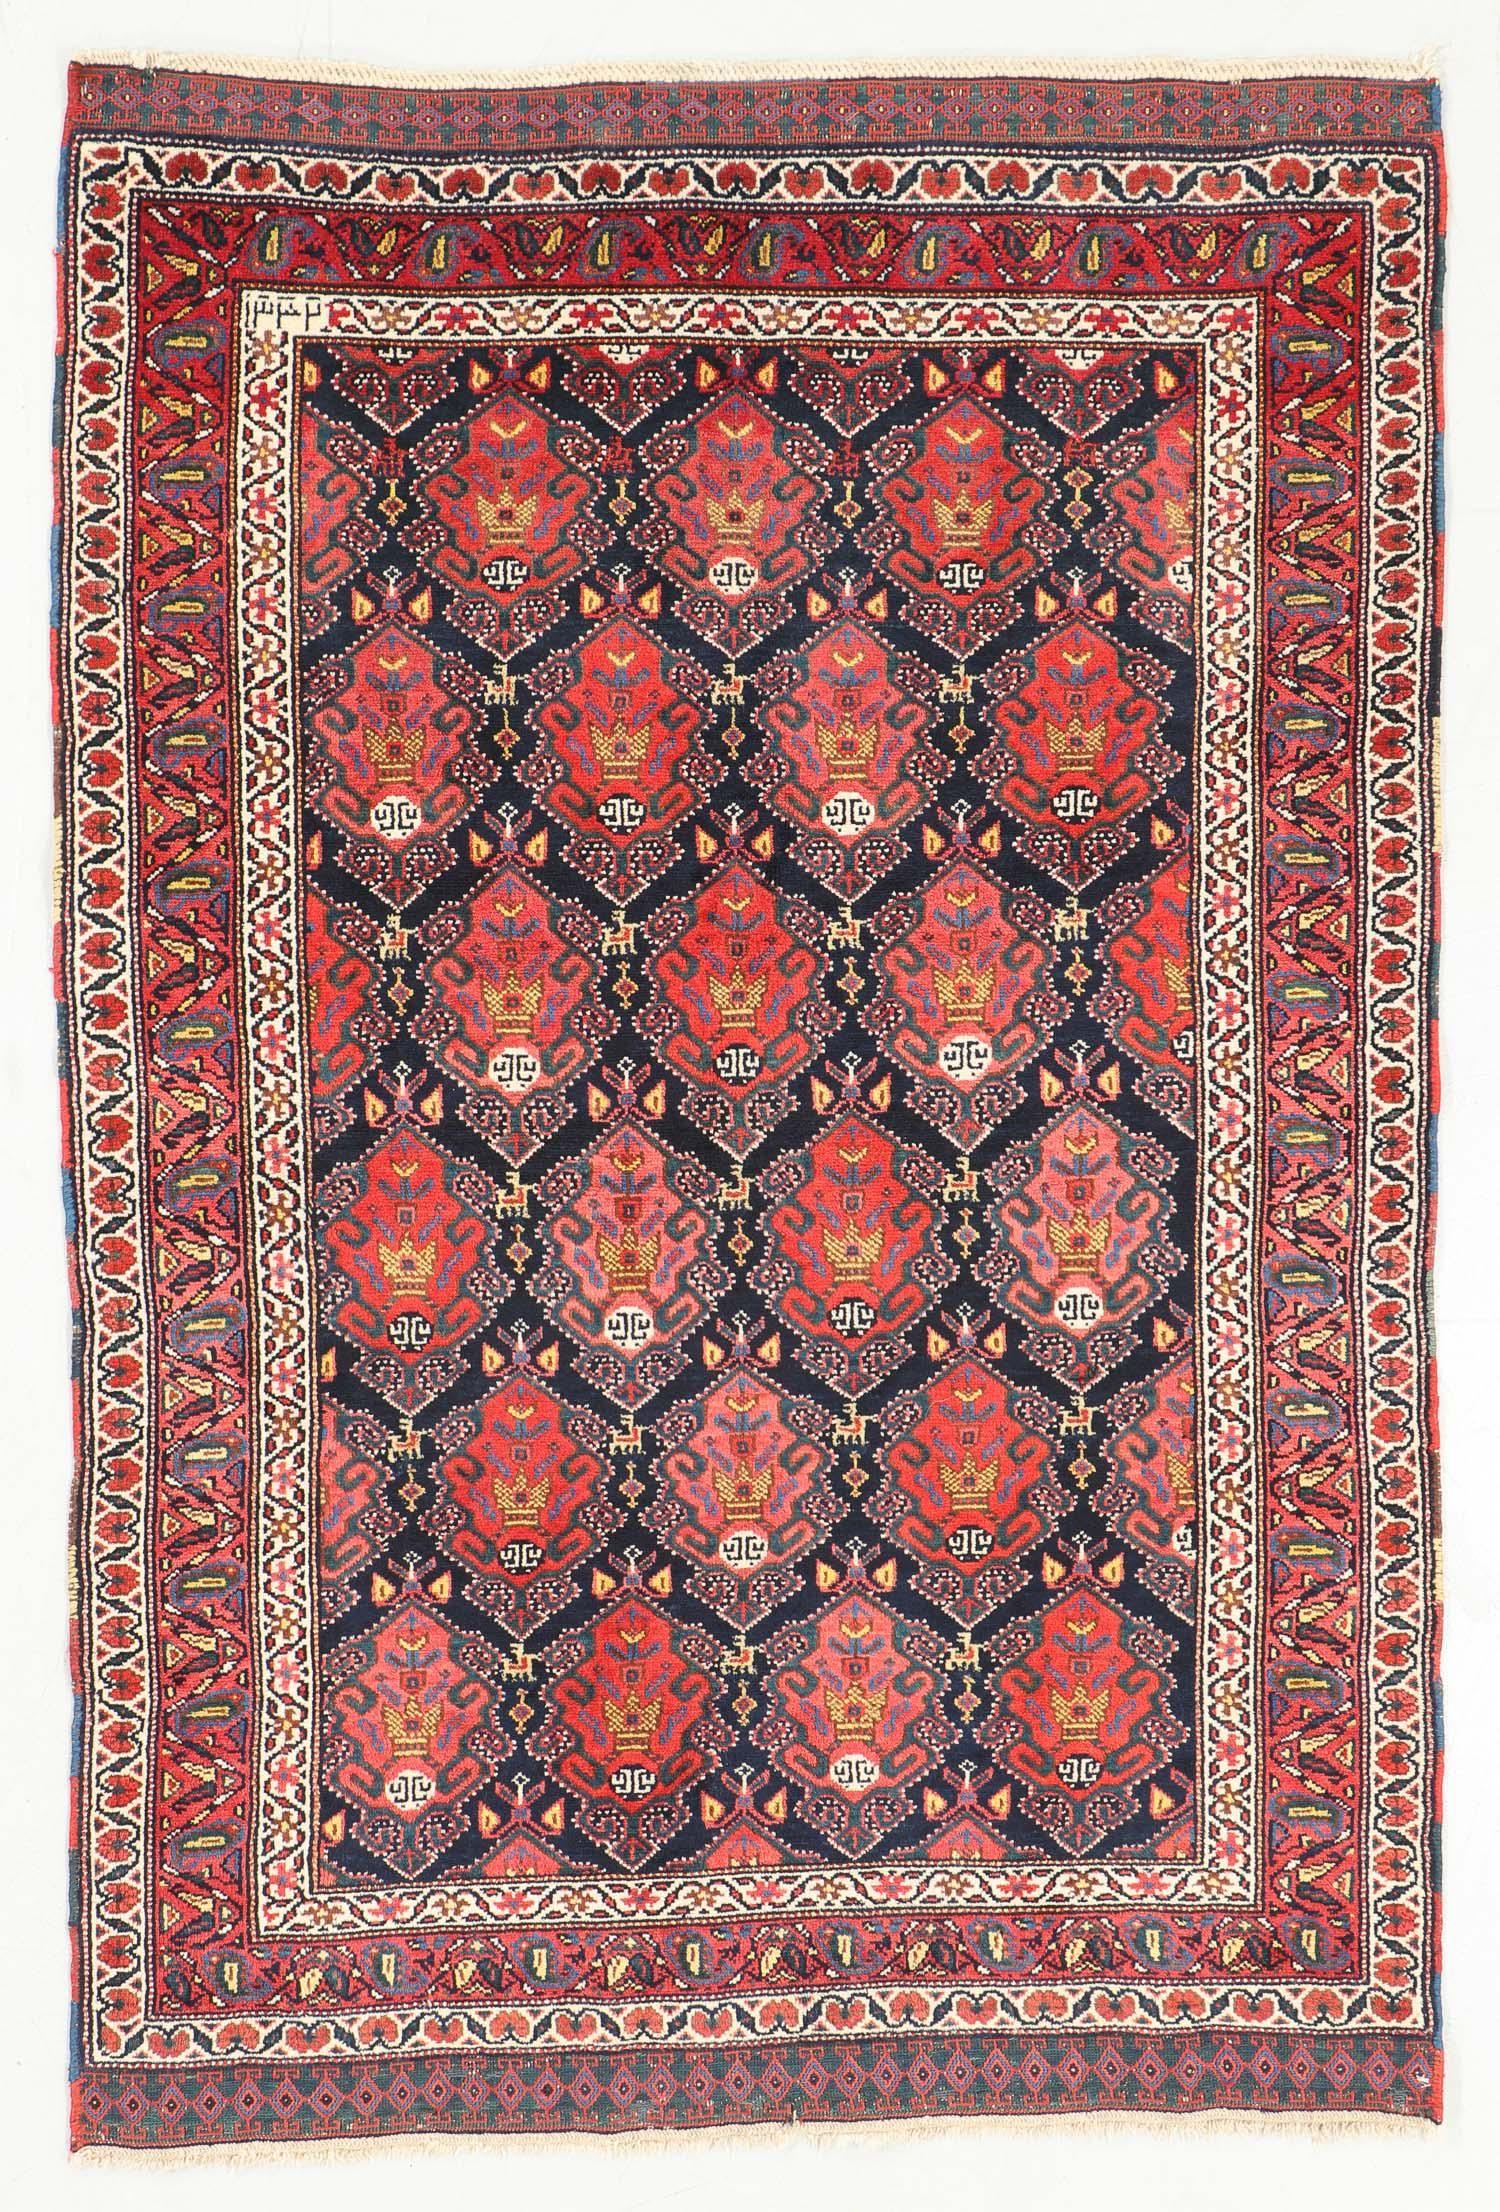 Antique Afshar Rug, Persia: 3'5'' x 5'1''